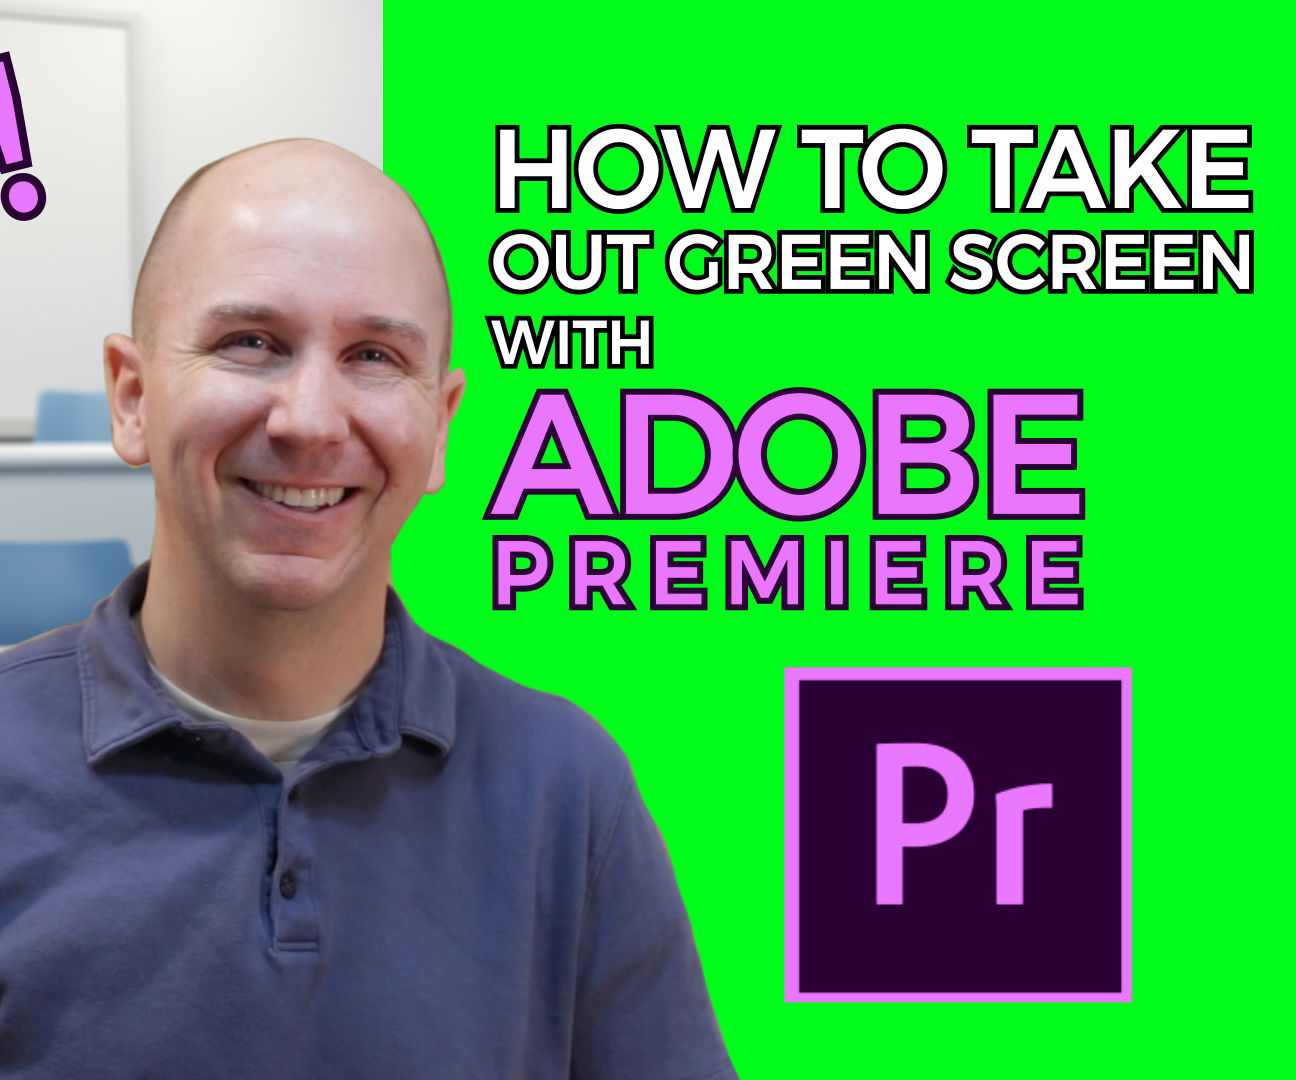 How to Remove Green Screen in Adobe Premiere Pro CC: 10